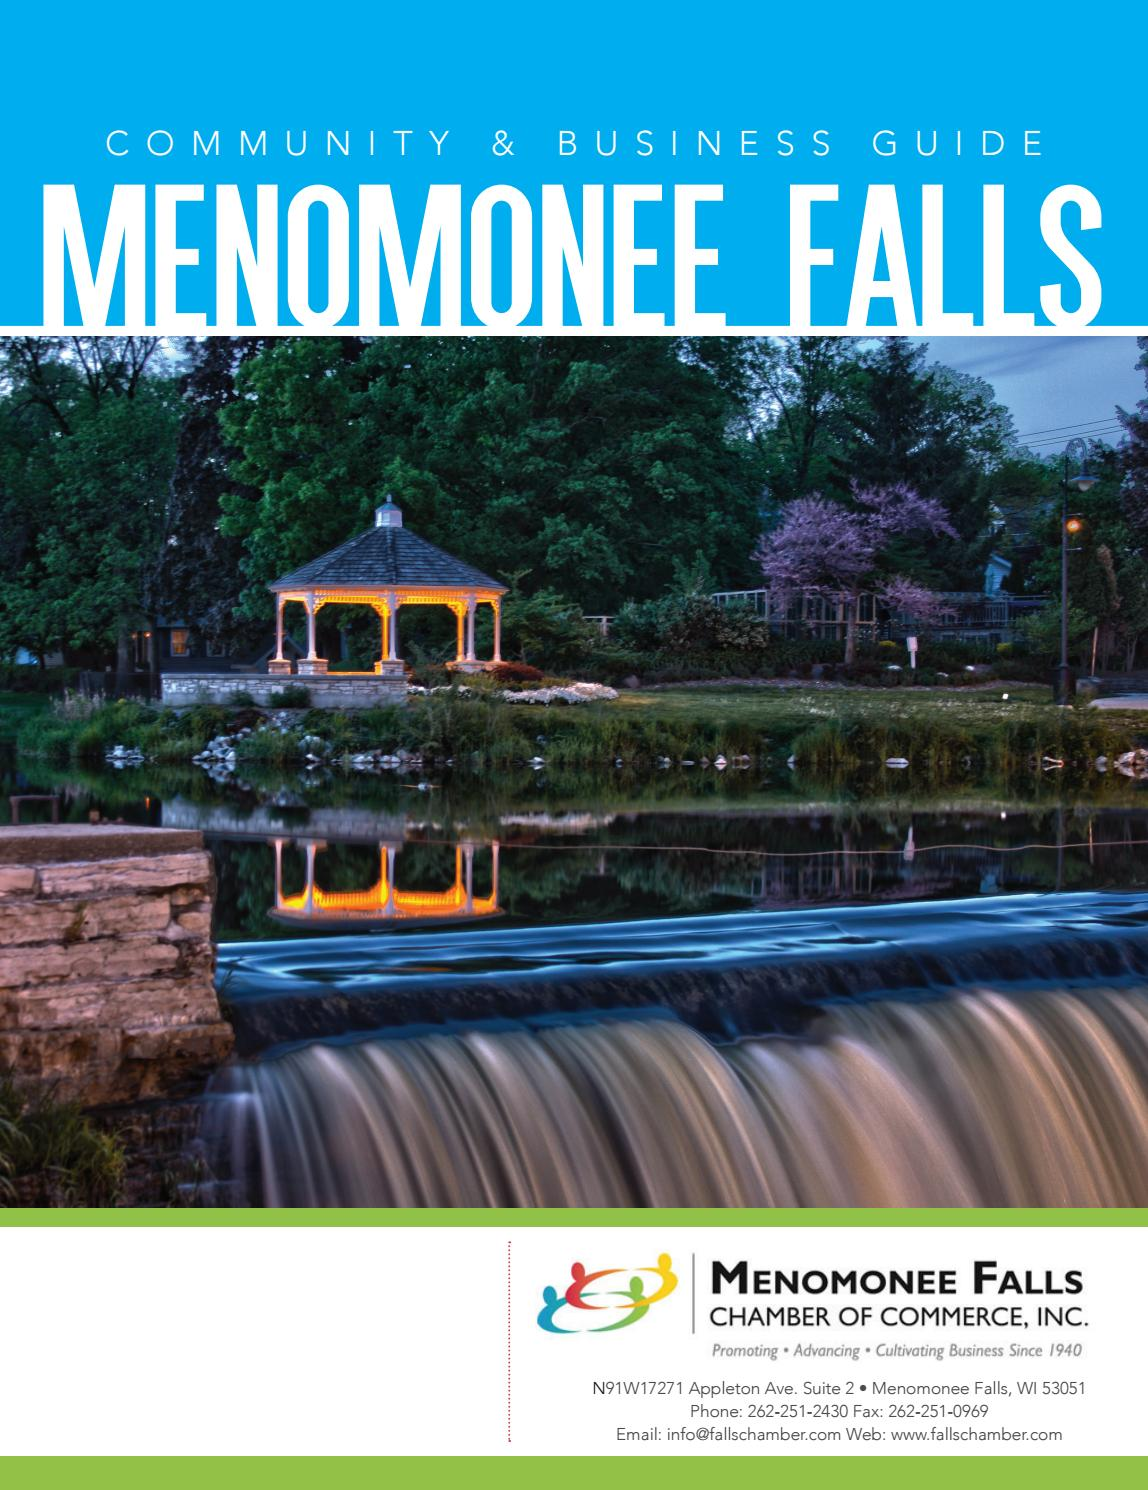 menomonee falls food pantry